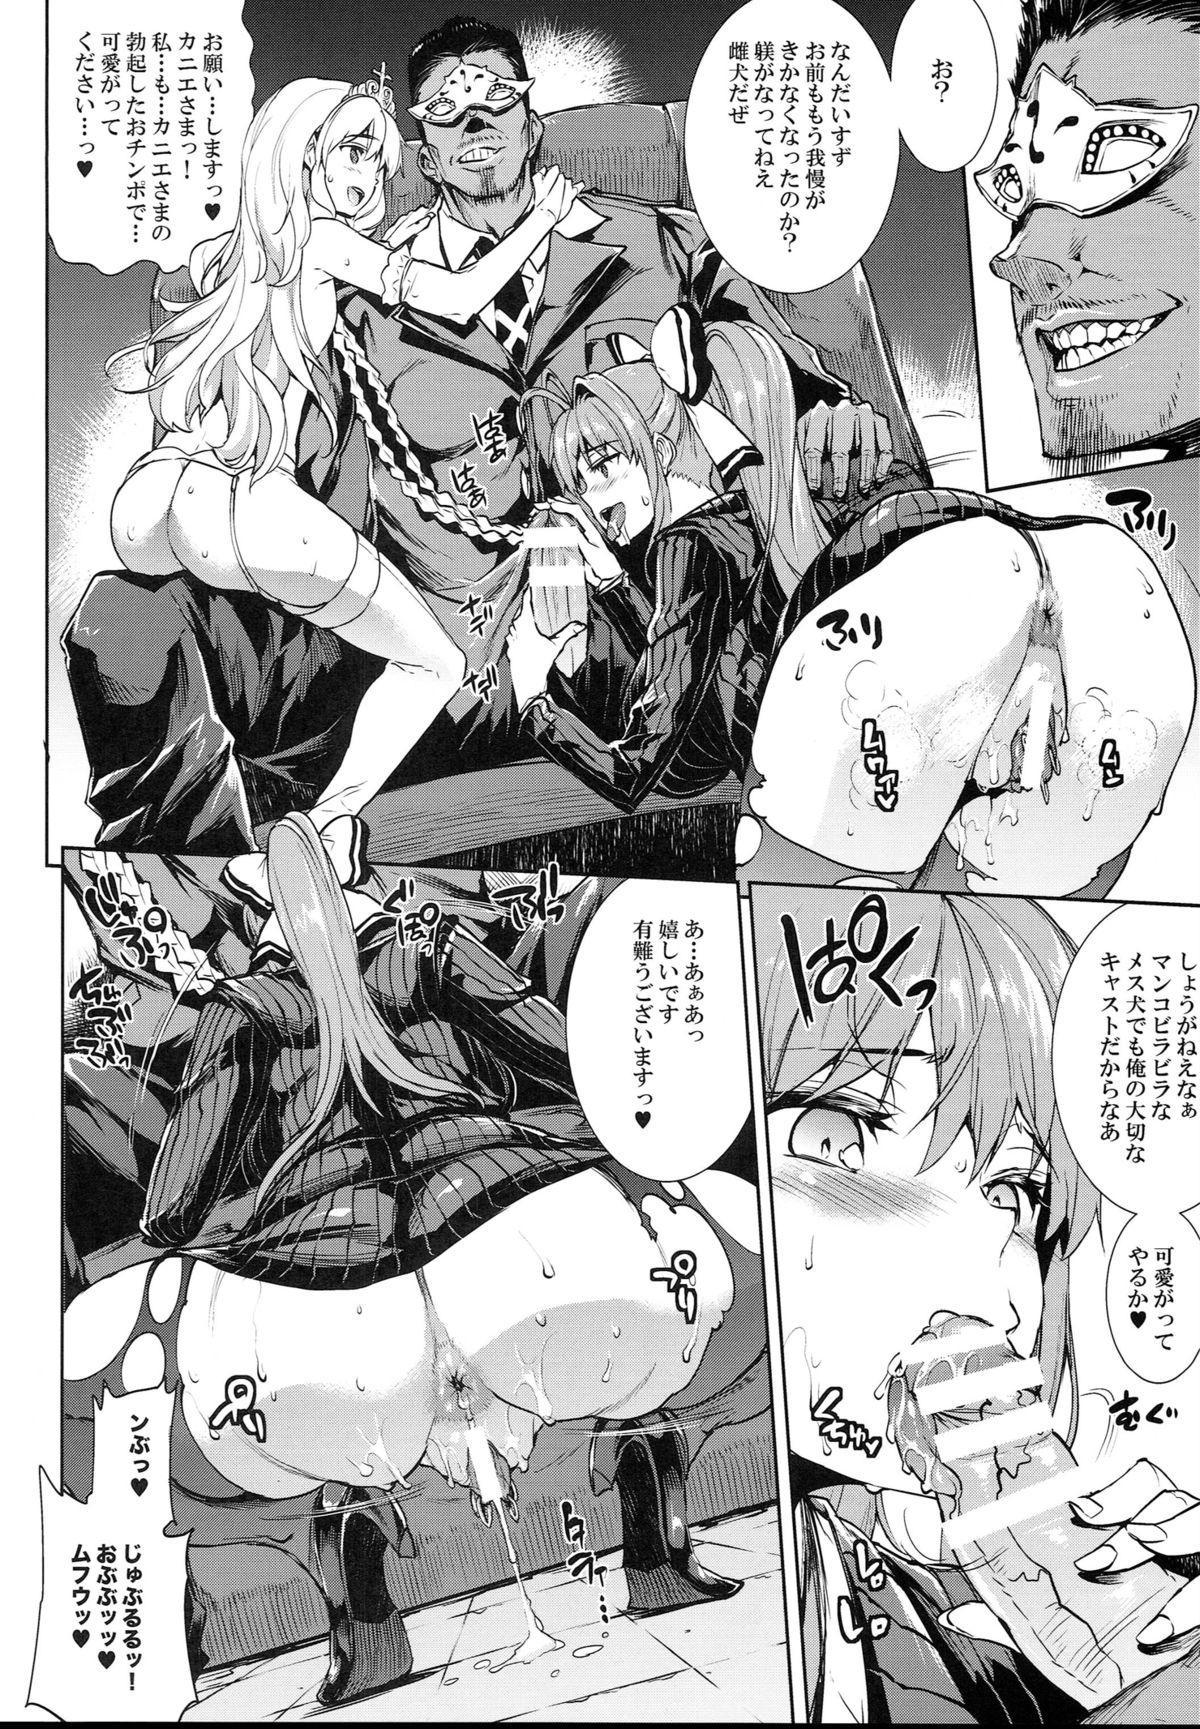 Amagi Erect Sawaru parade 22